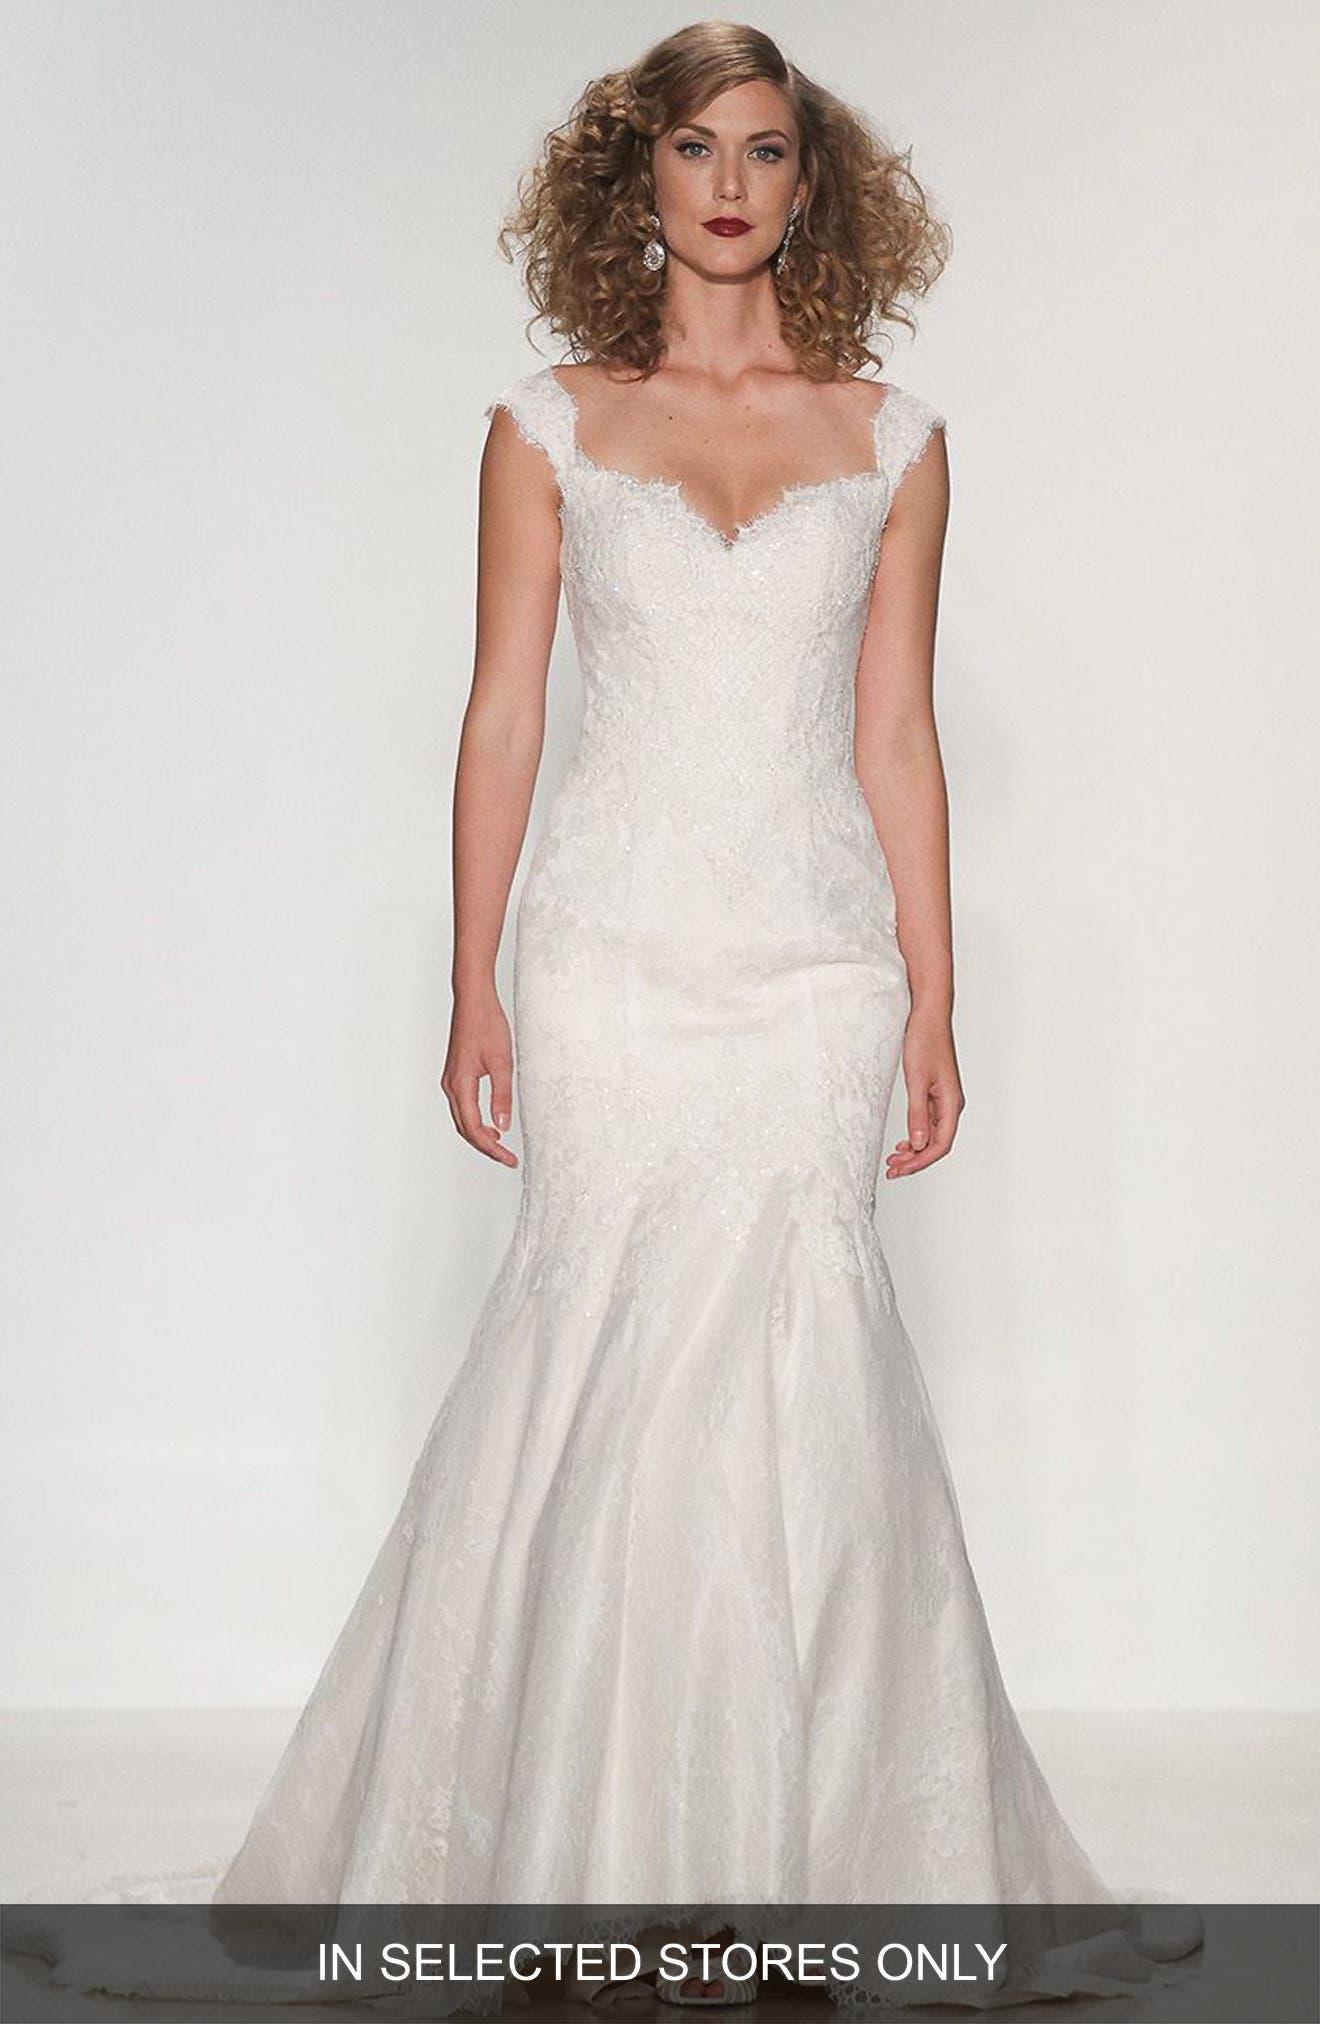 Loren Sweetheart Neck Silk Lace Trumpet Dress,                         Main,                         color, Deep Ivory/Off White